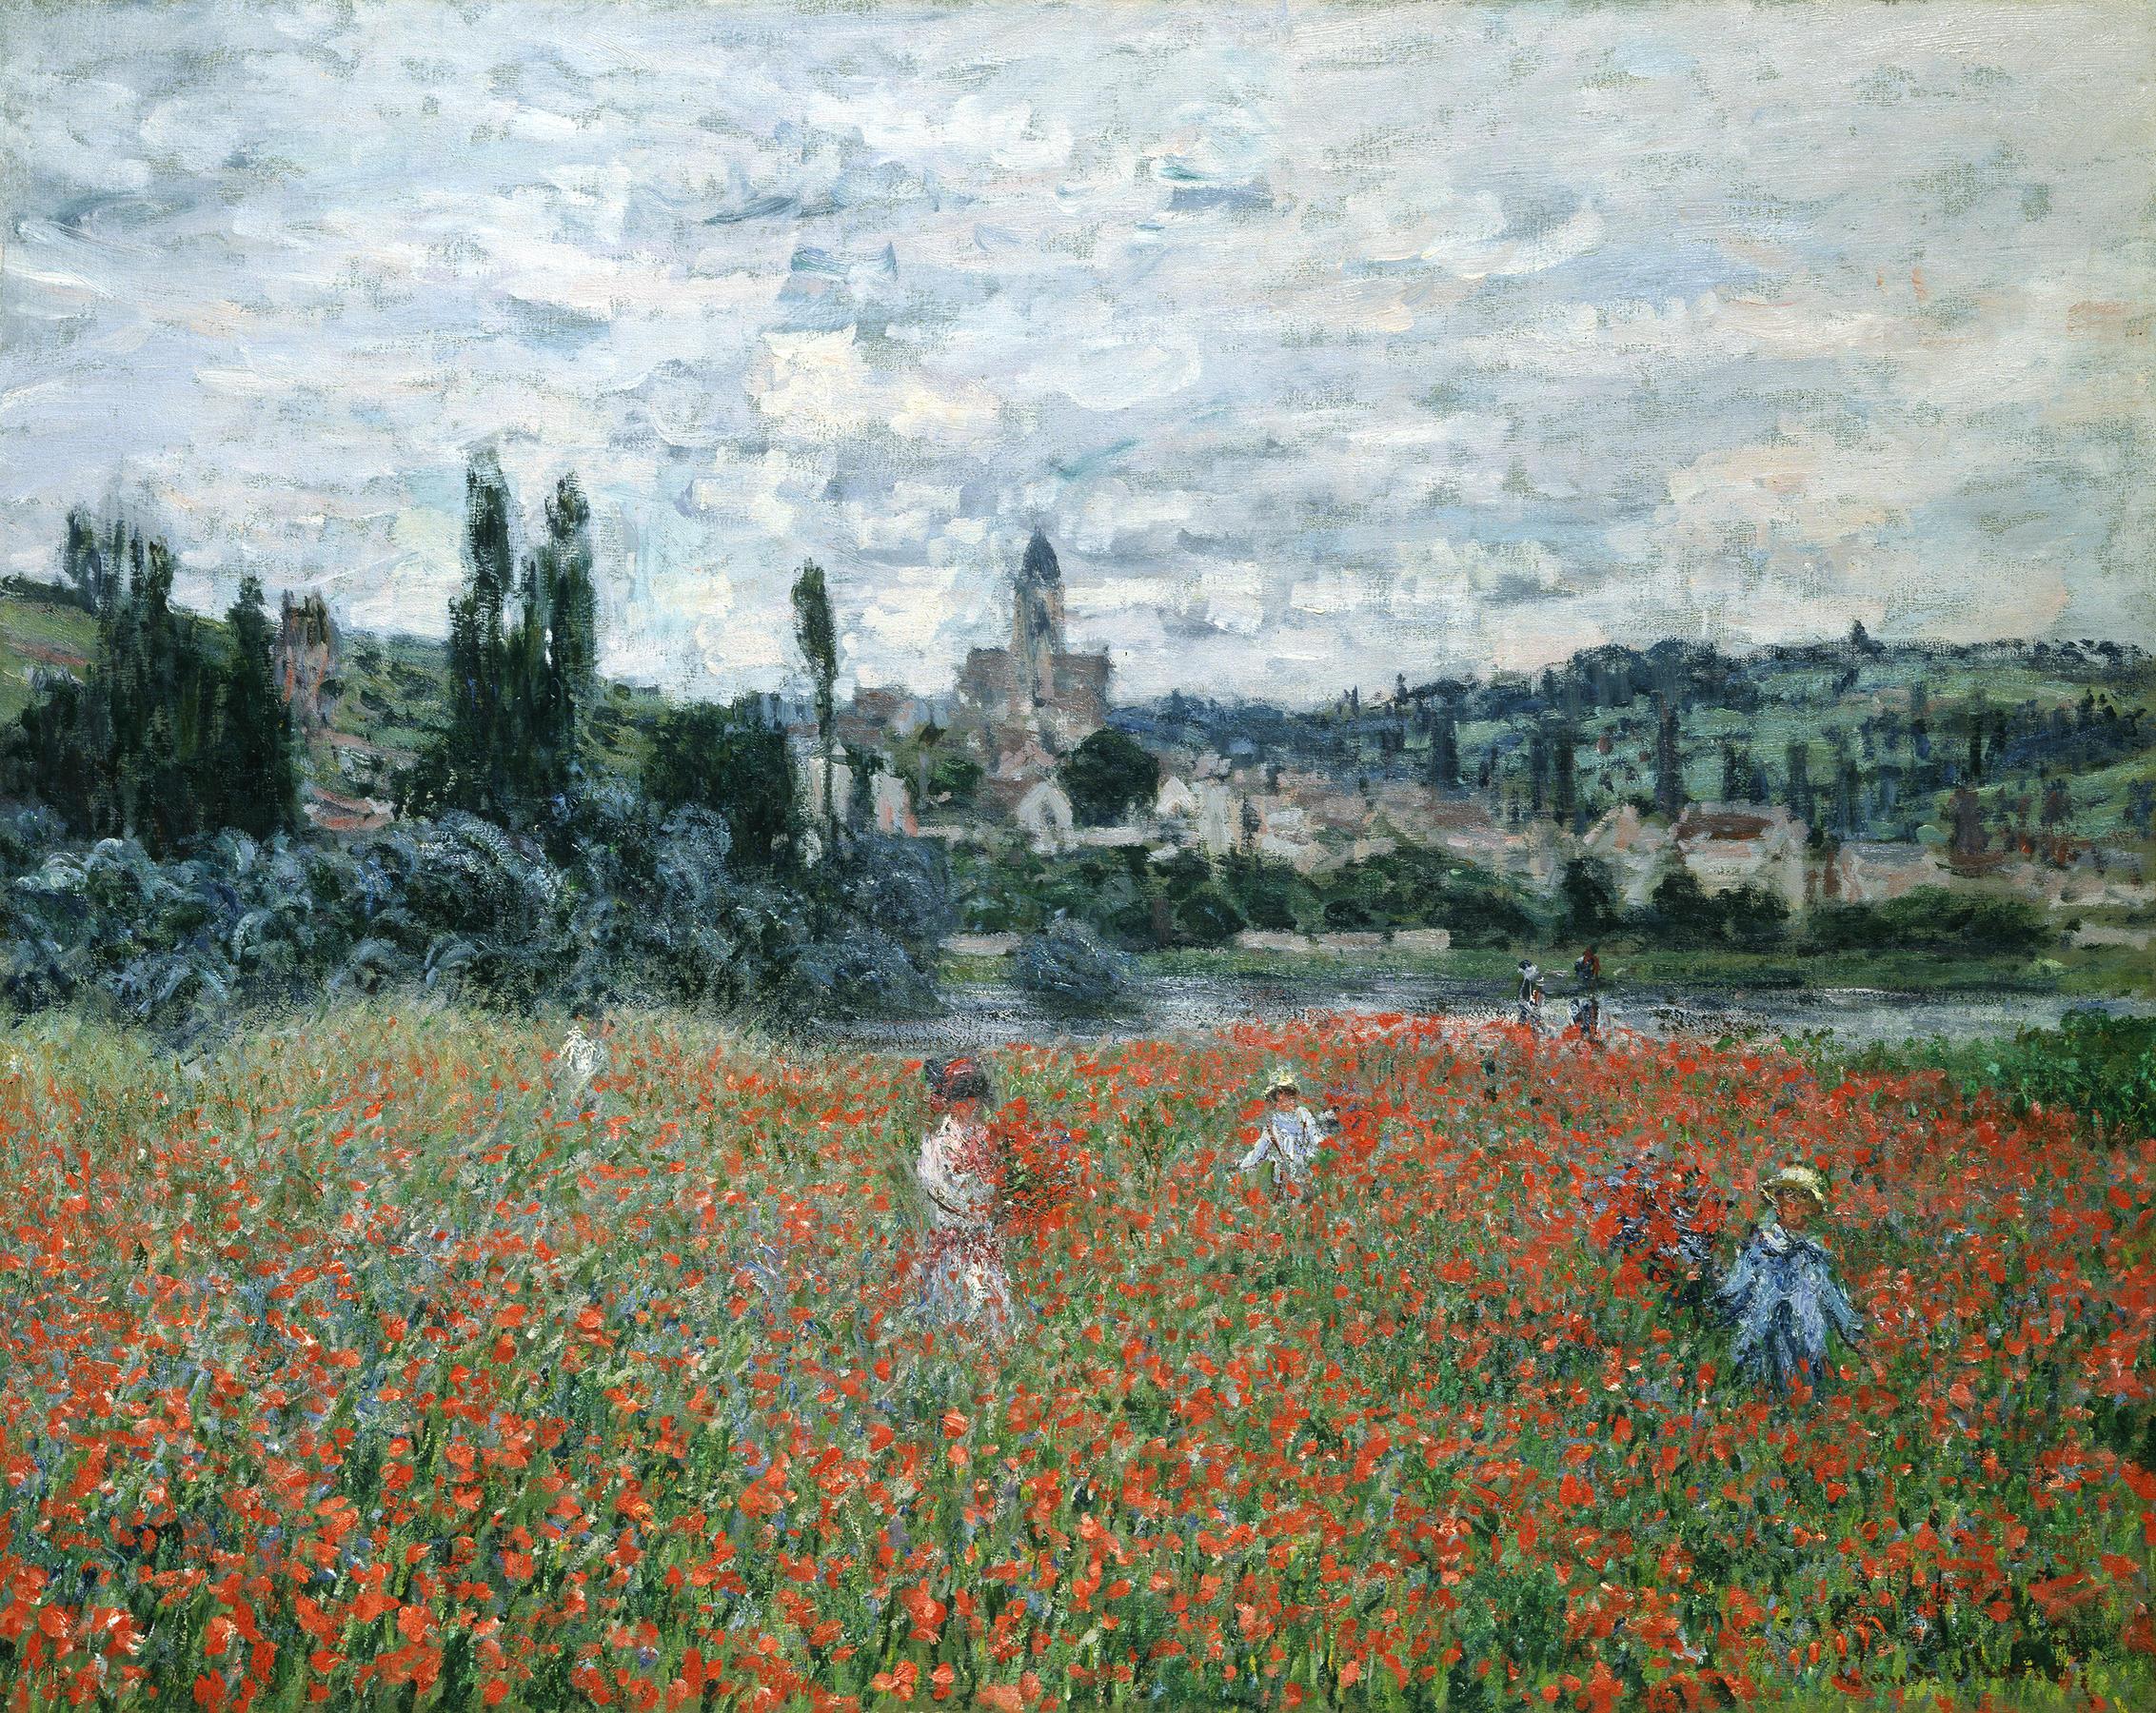 Campo di papaveri a Vetheuil